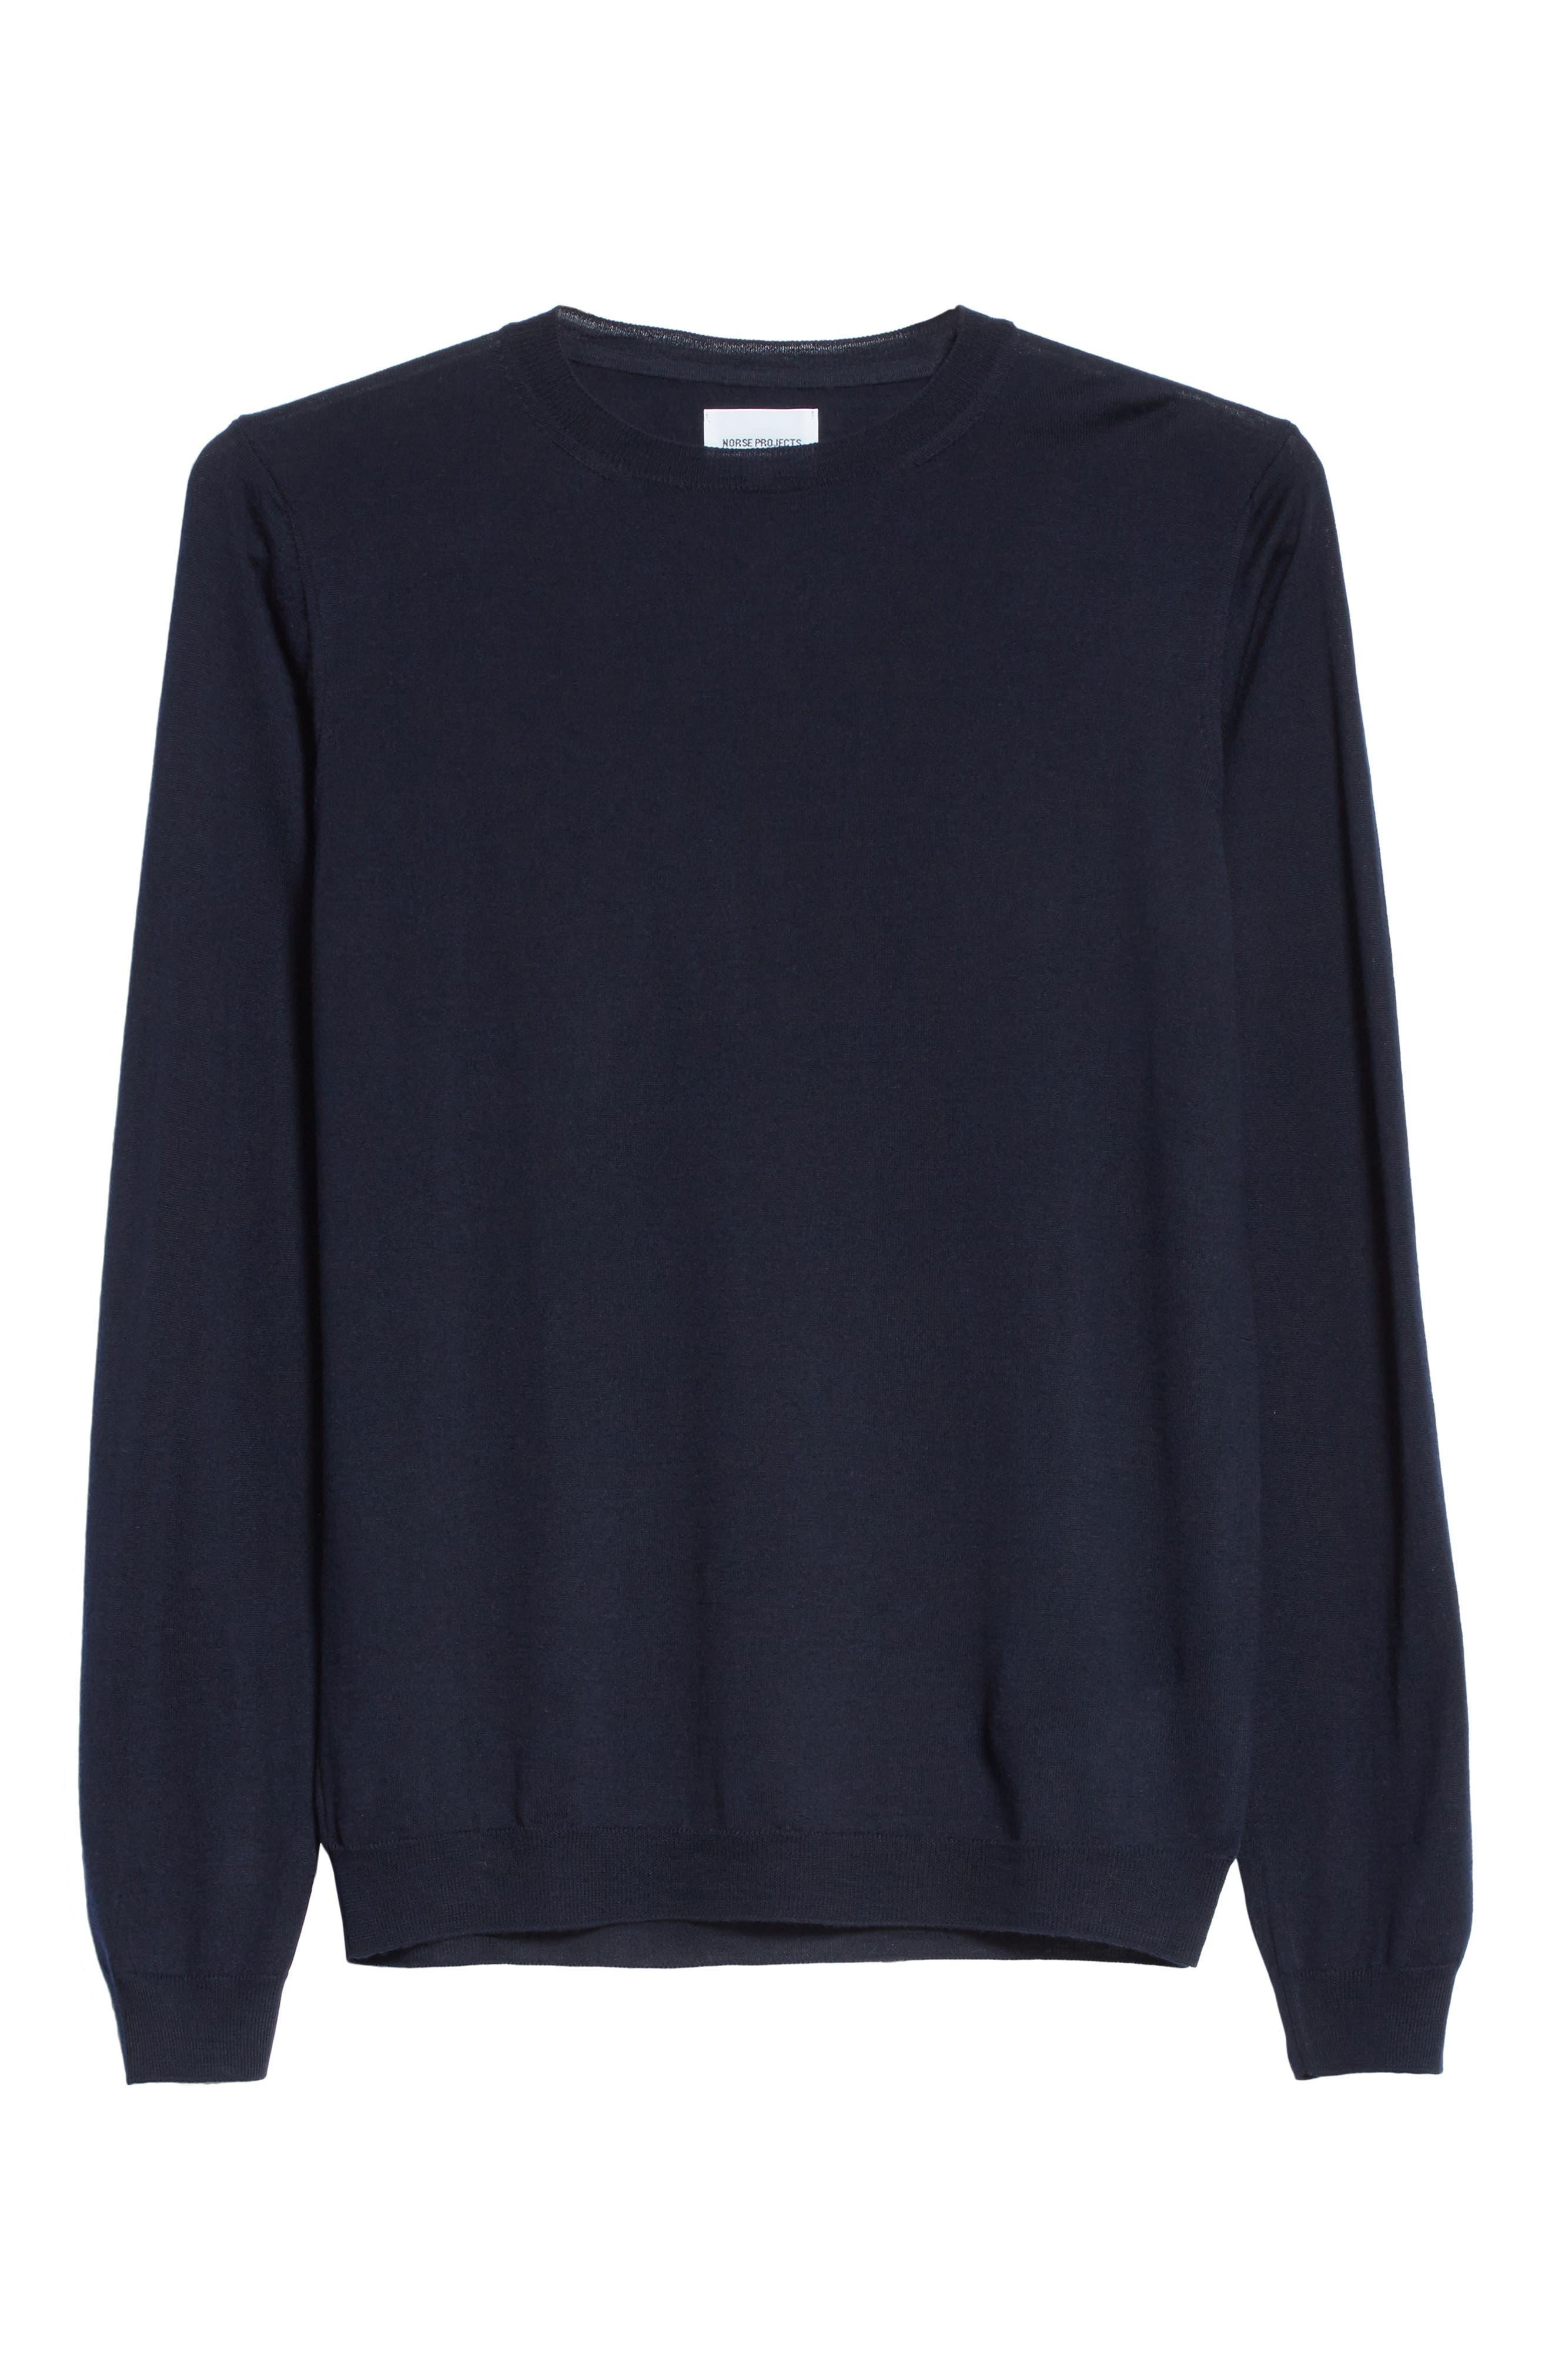 Sigfred Merino Wool & Silk Crewneck Sweater,                             Alternate thumbnail 6, color,                             412